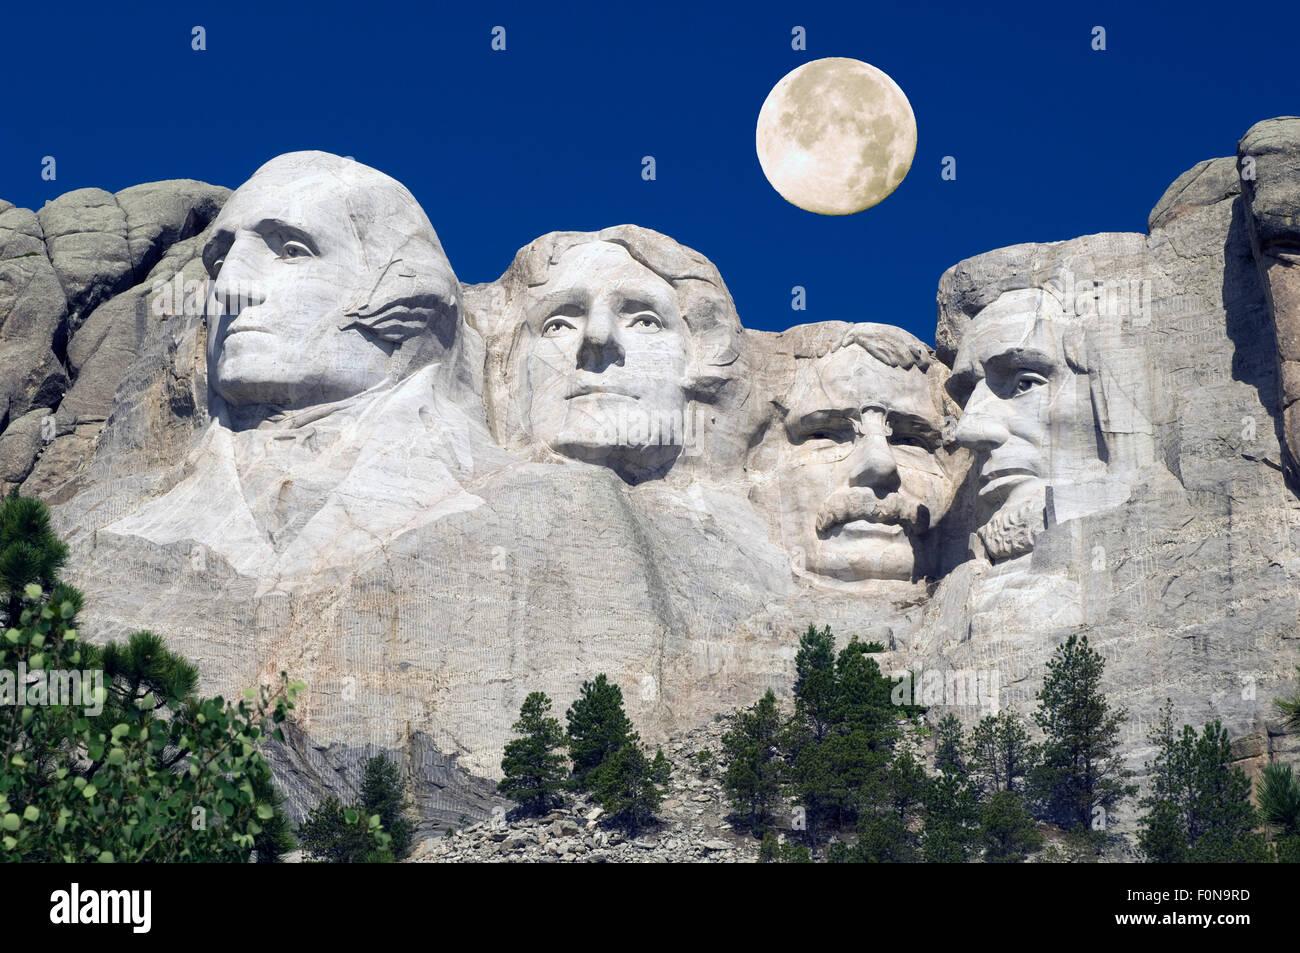 Mount Rushmore National Monument. Black Hills, South Dakota, USA. Stock Photo